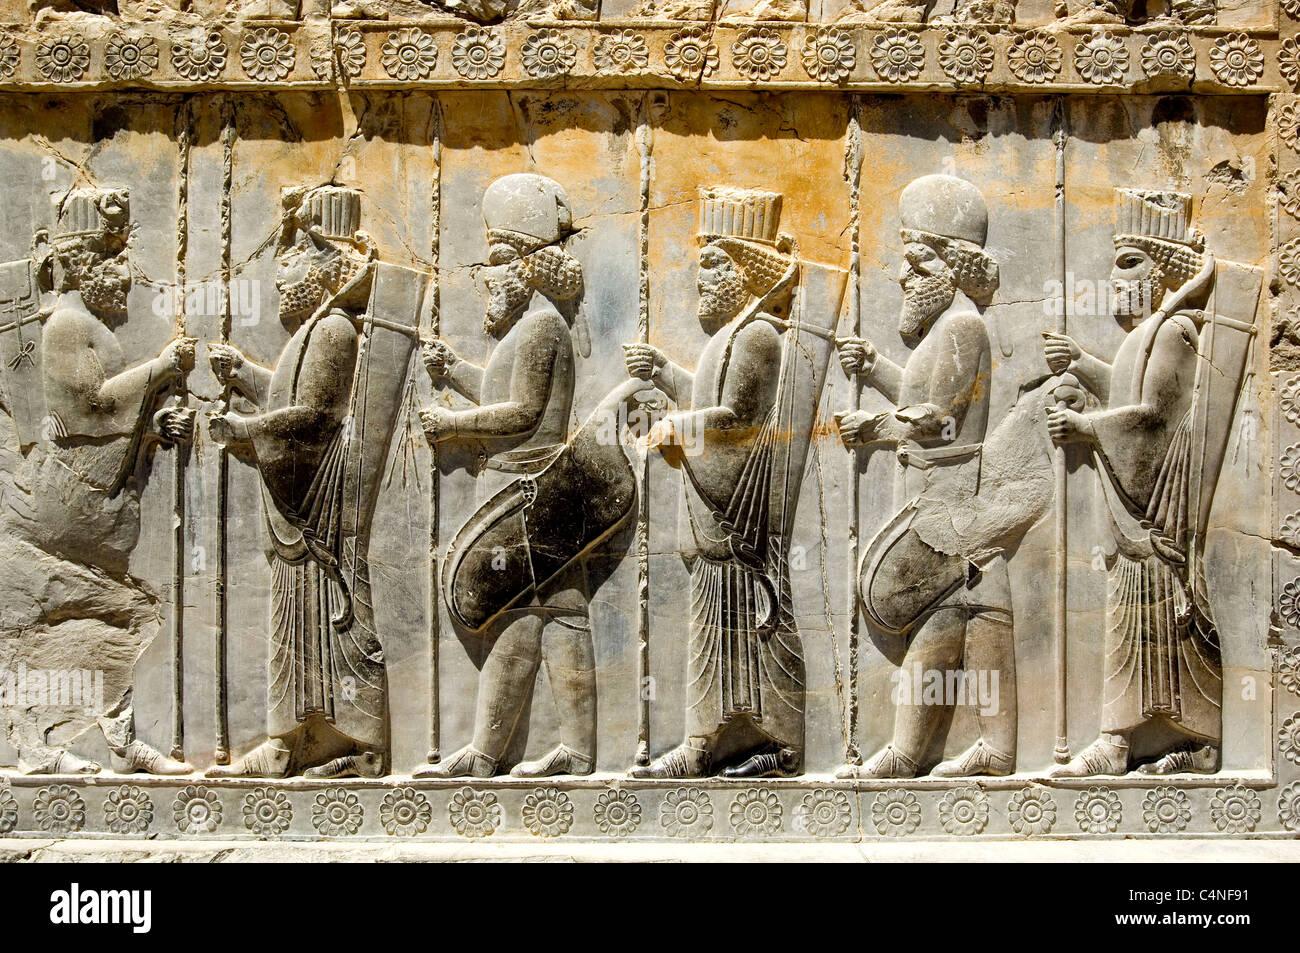 Iran Iranian Persia Persian Art High Resolution Stock Photography And Images Alamy